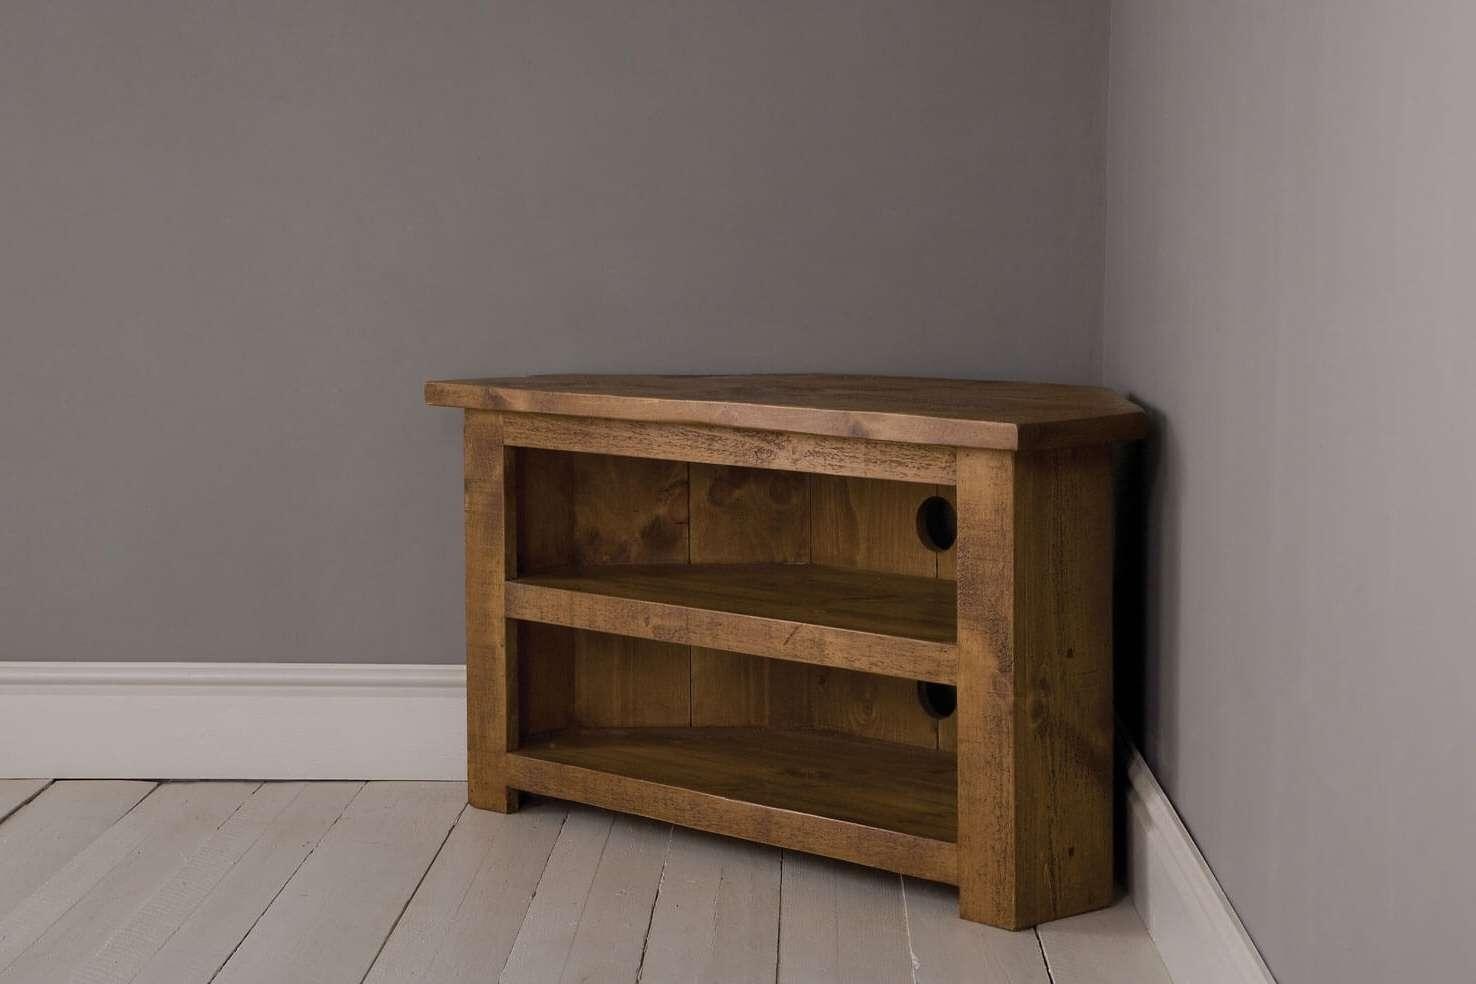 Plank Corner Tv Unit With Shelfindigo Furniture For Wooden Corner Tv Cabinets (View 14 of 20)